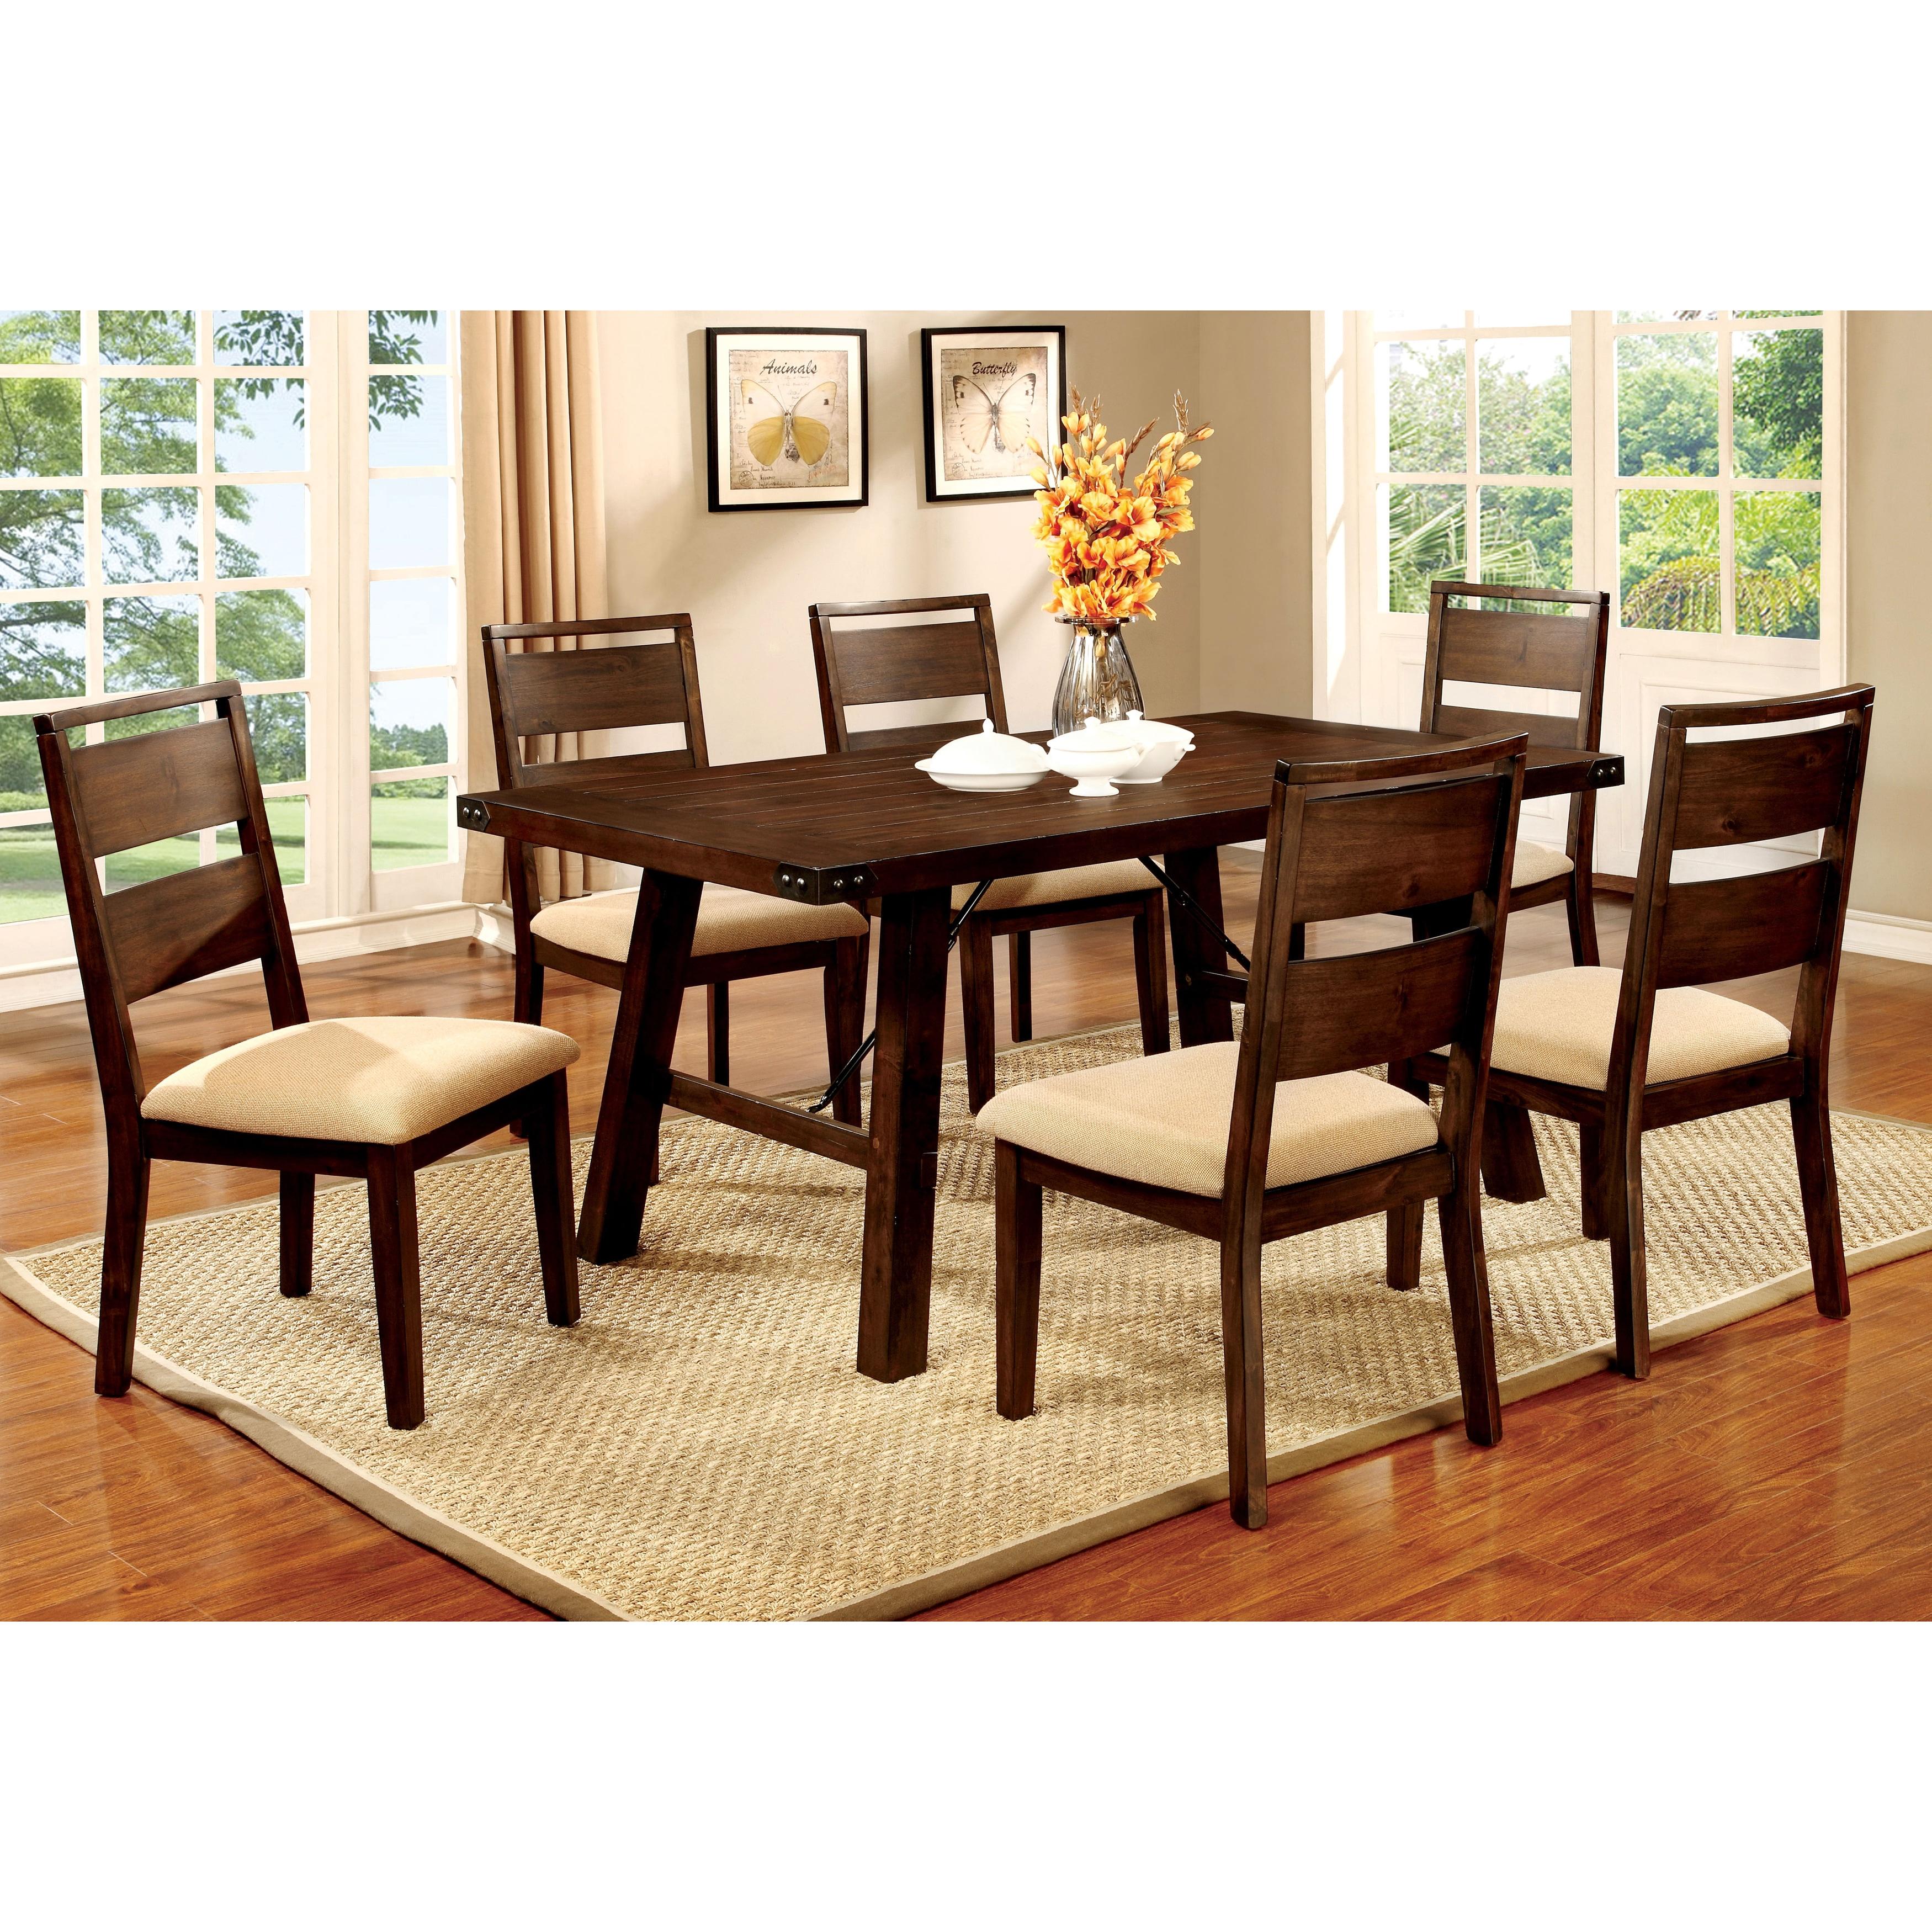 Furniture of America Montelle 7-piece Dark Oak Dining Set...